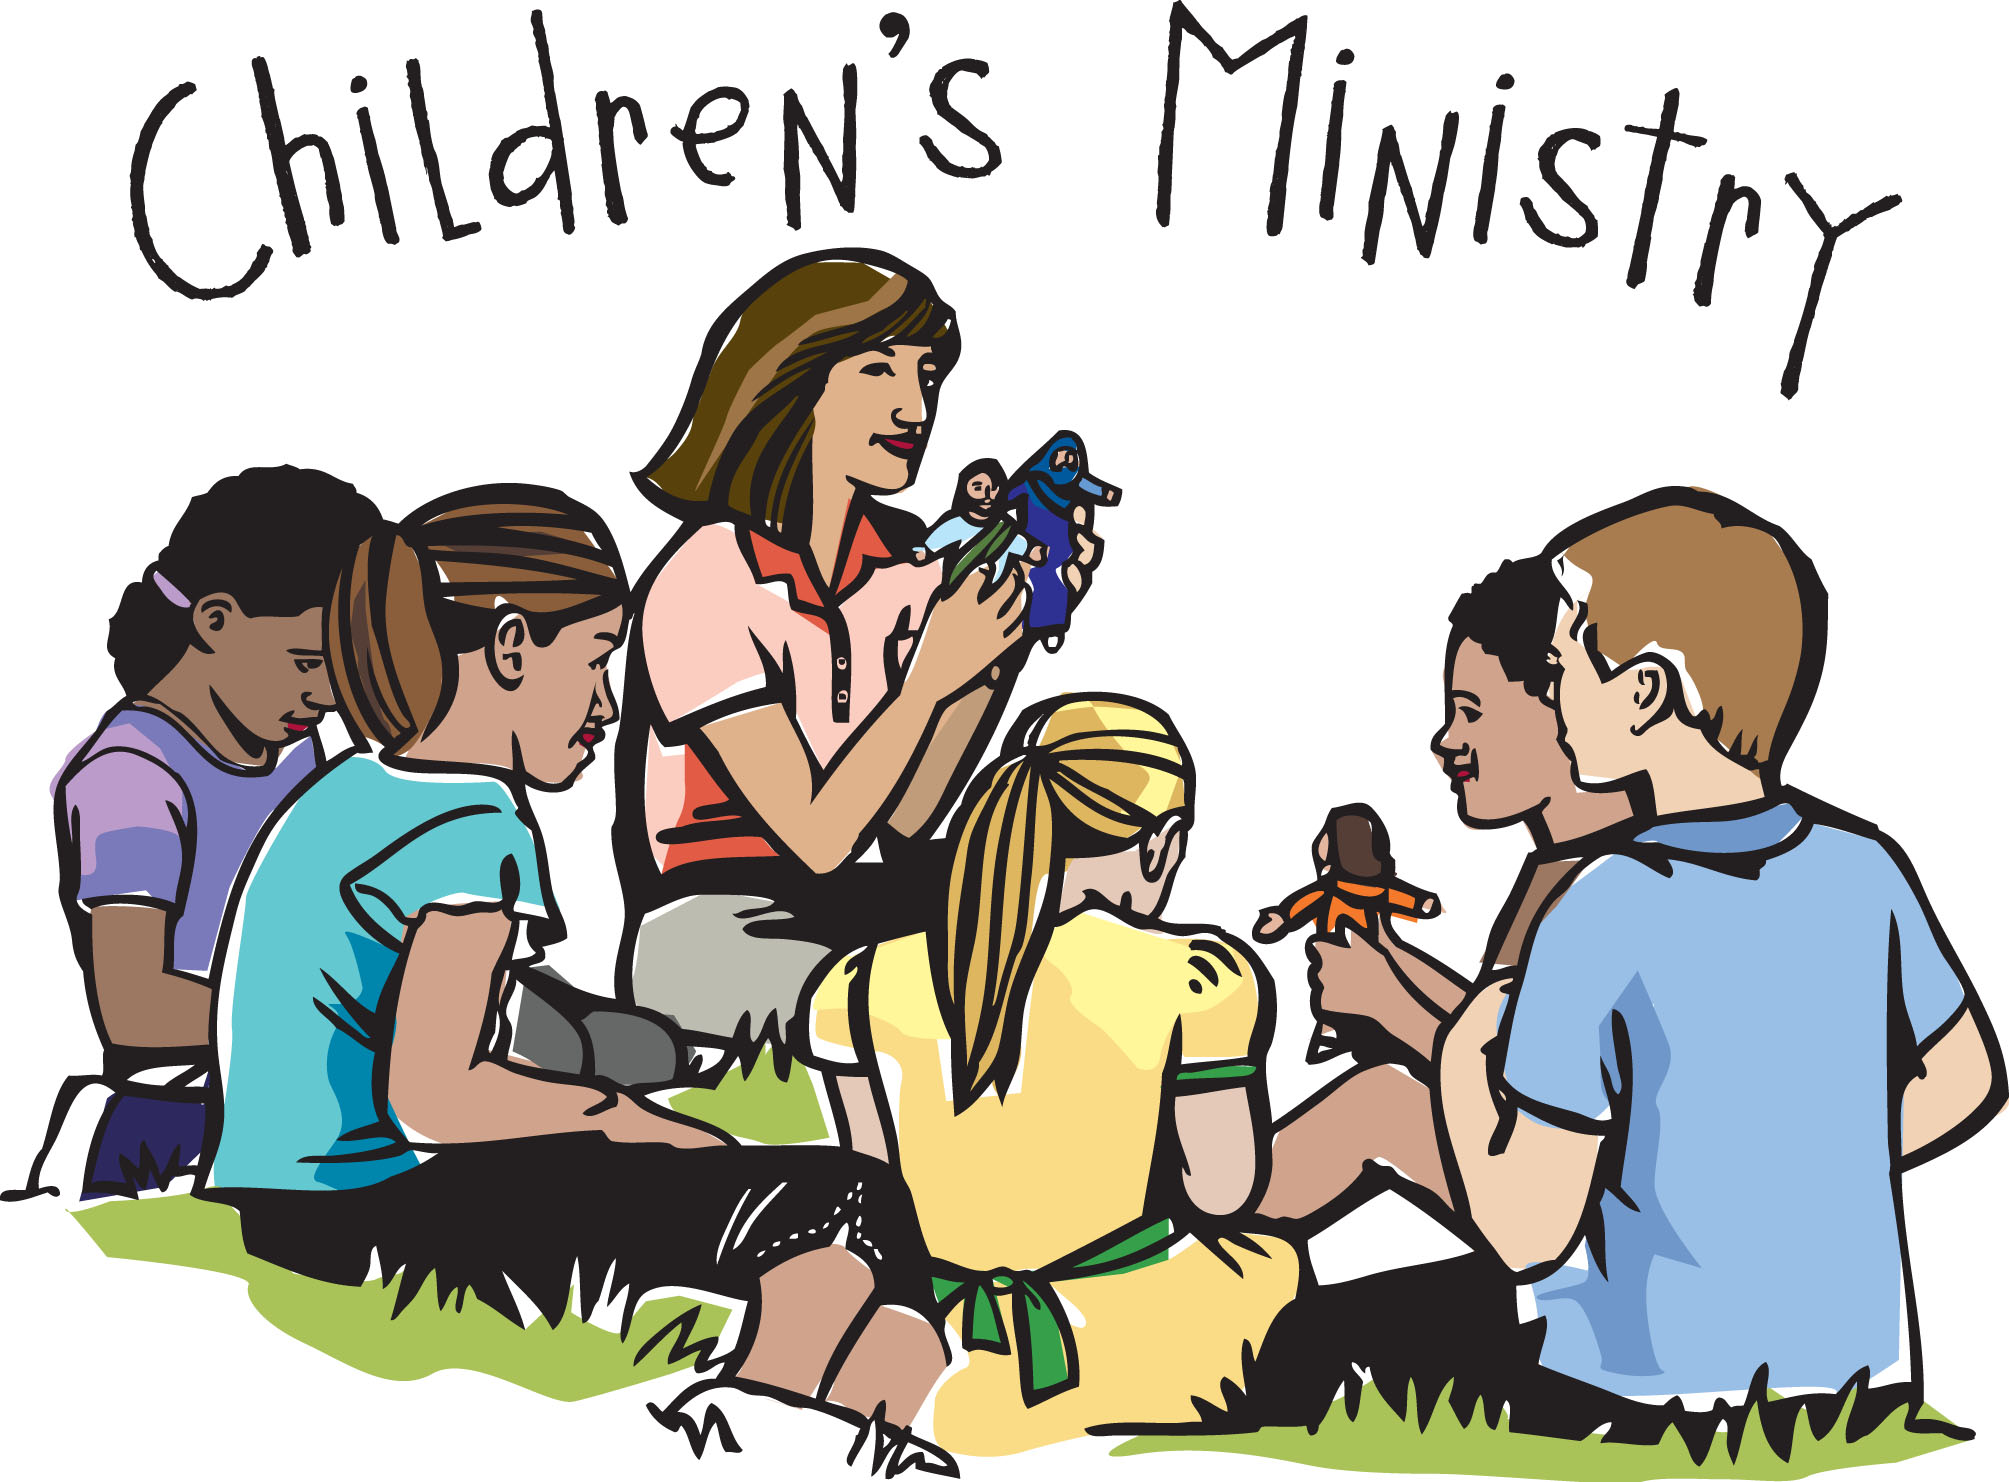 Vector Art - Kid girl church confession. EPS clipart gg101617794 - GoGraph